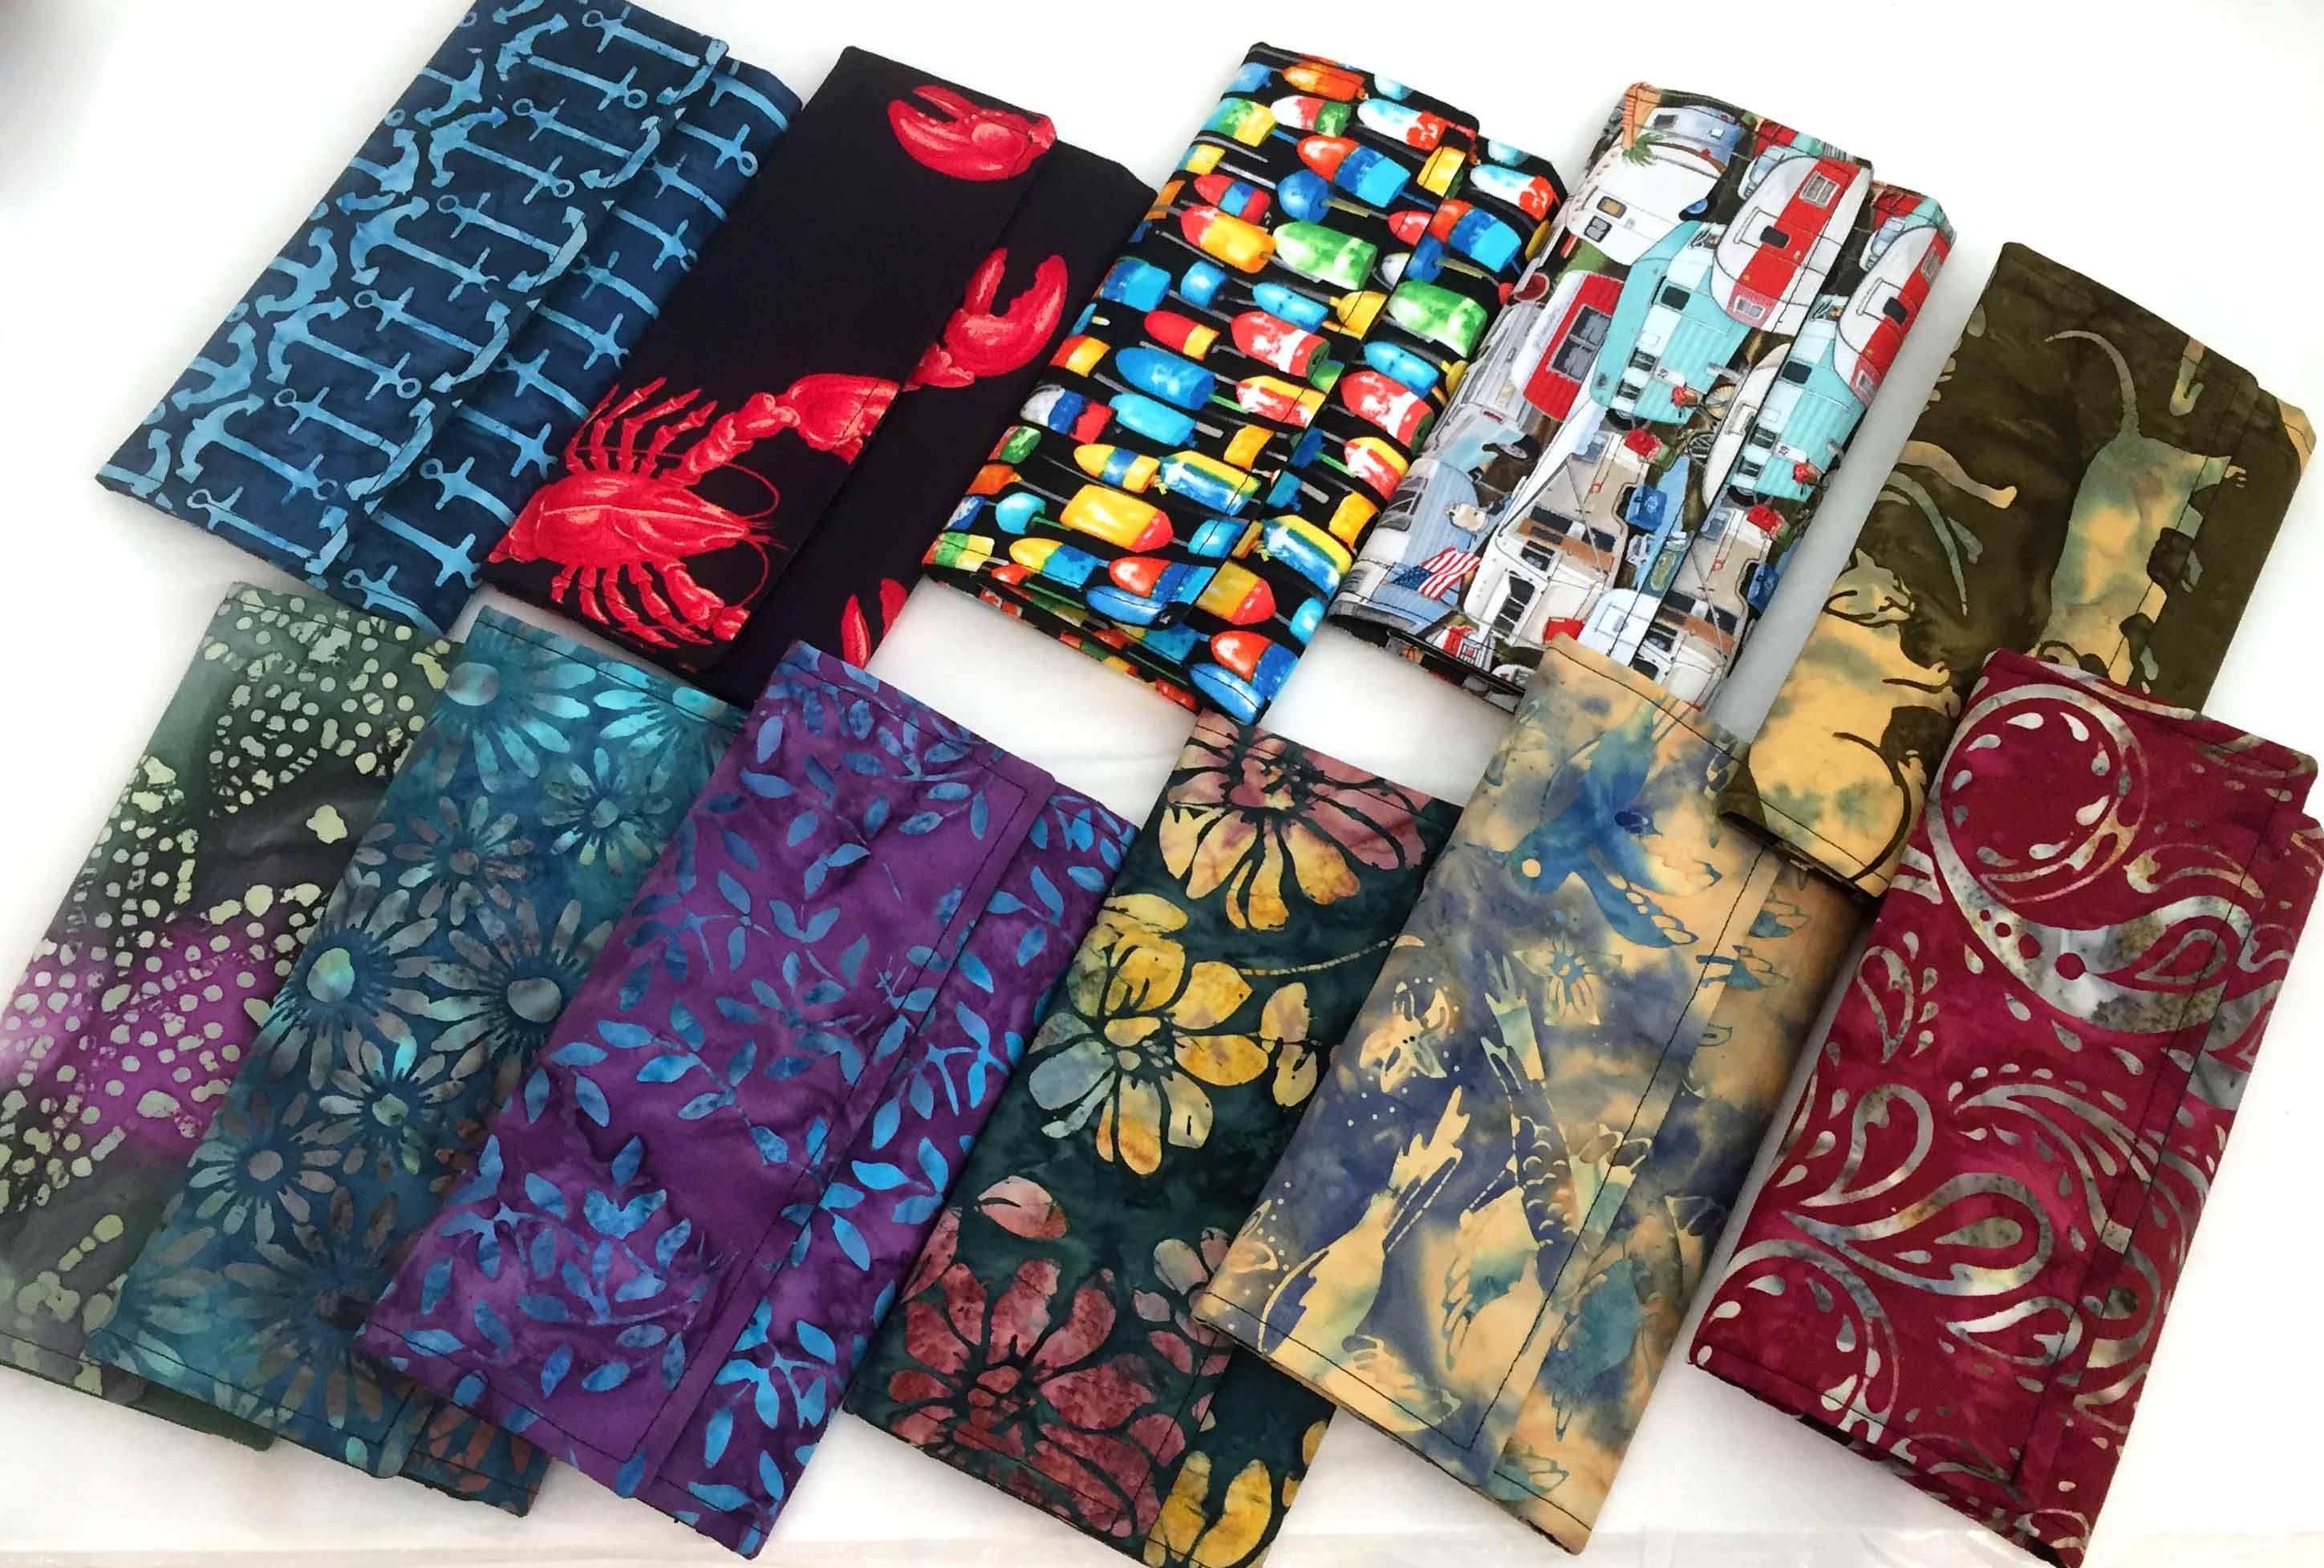 Nancy's Bags Wallets - variety